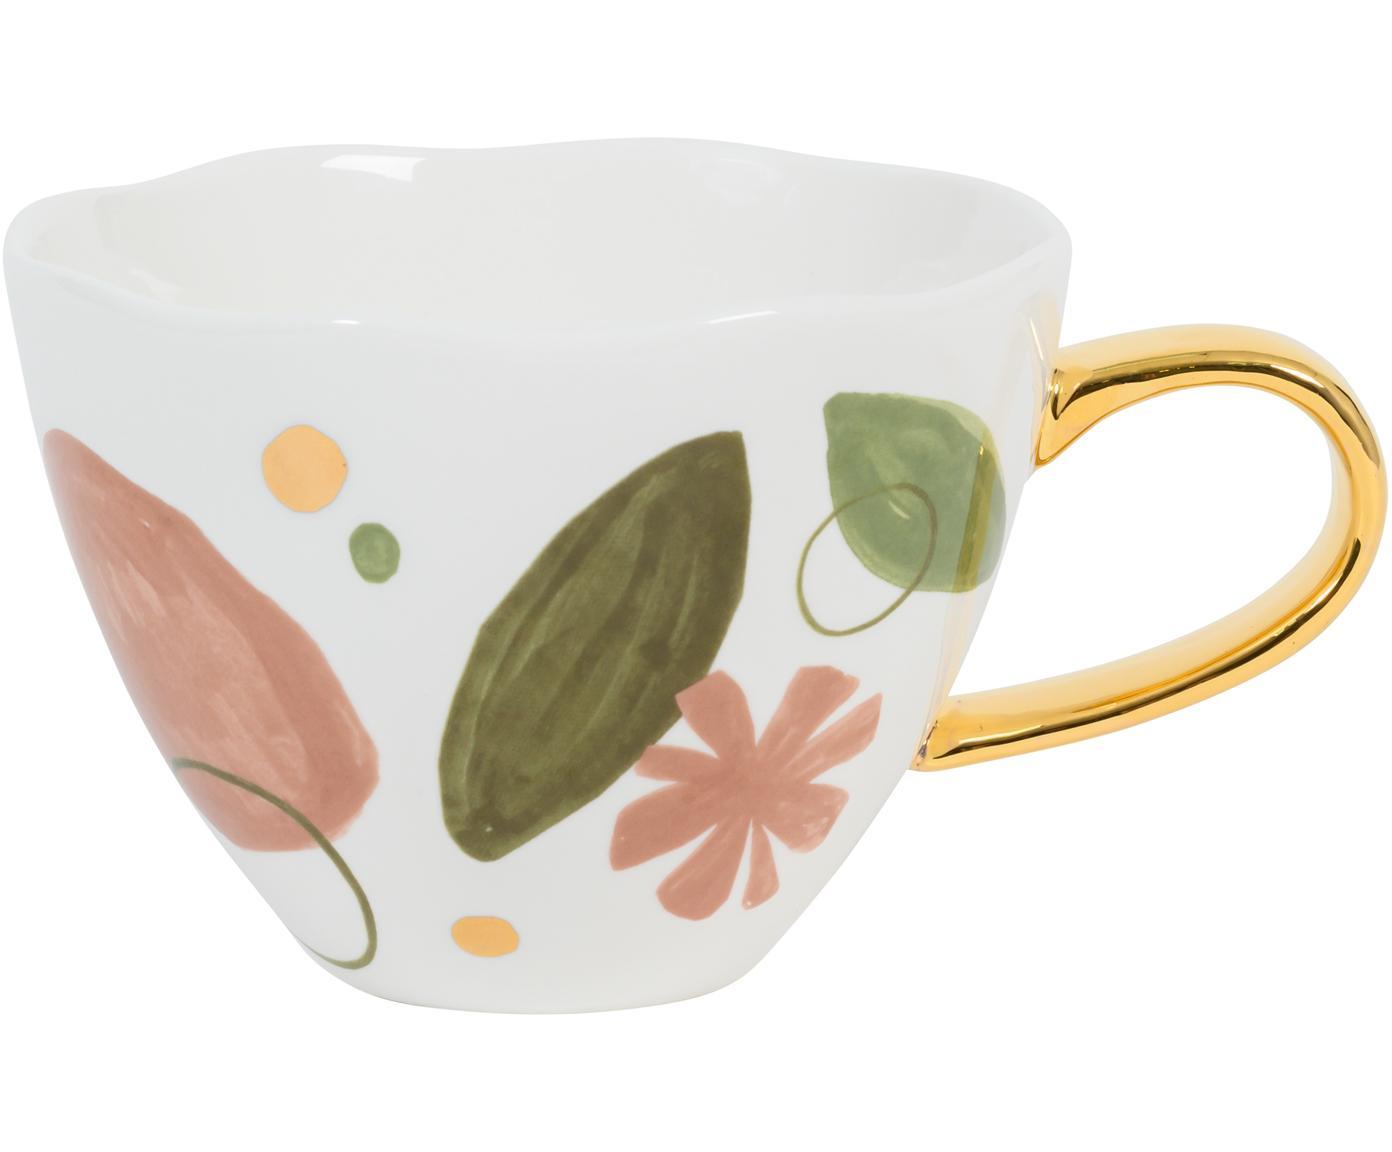 Koffiekopje Expressive met goudkleurig handvat, New Bone China, Wit, roze, groen, goudkleurig, Ø 11 cm